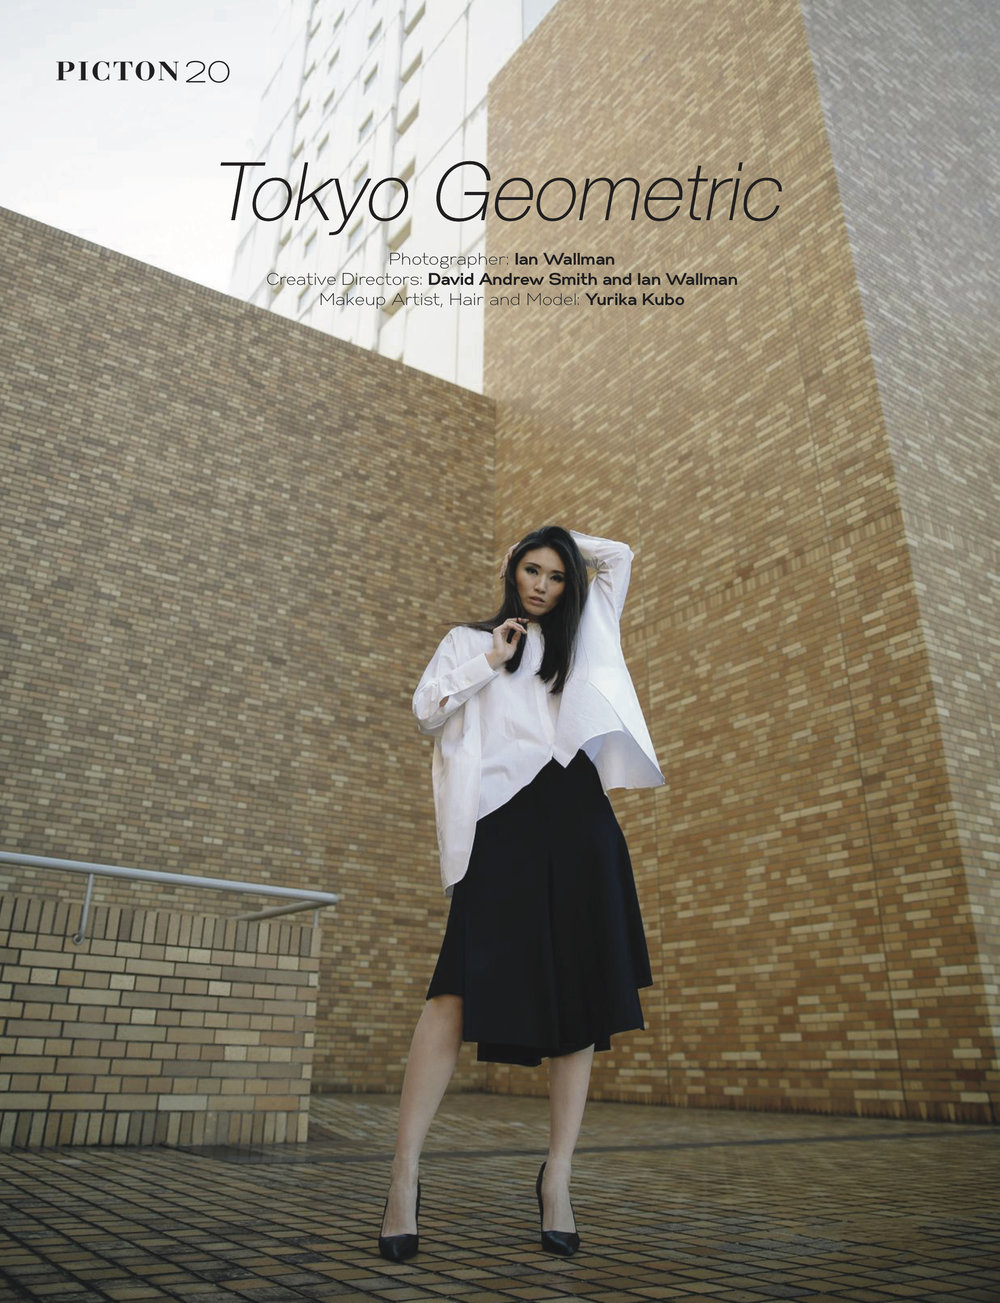 Picton_Magazine_Yurika Kubo 1.jpg